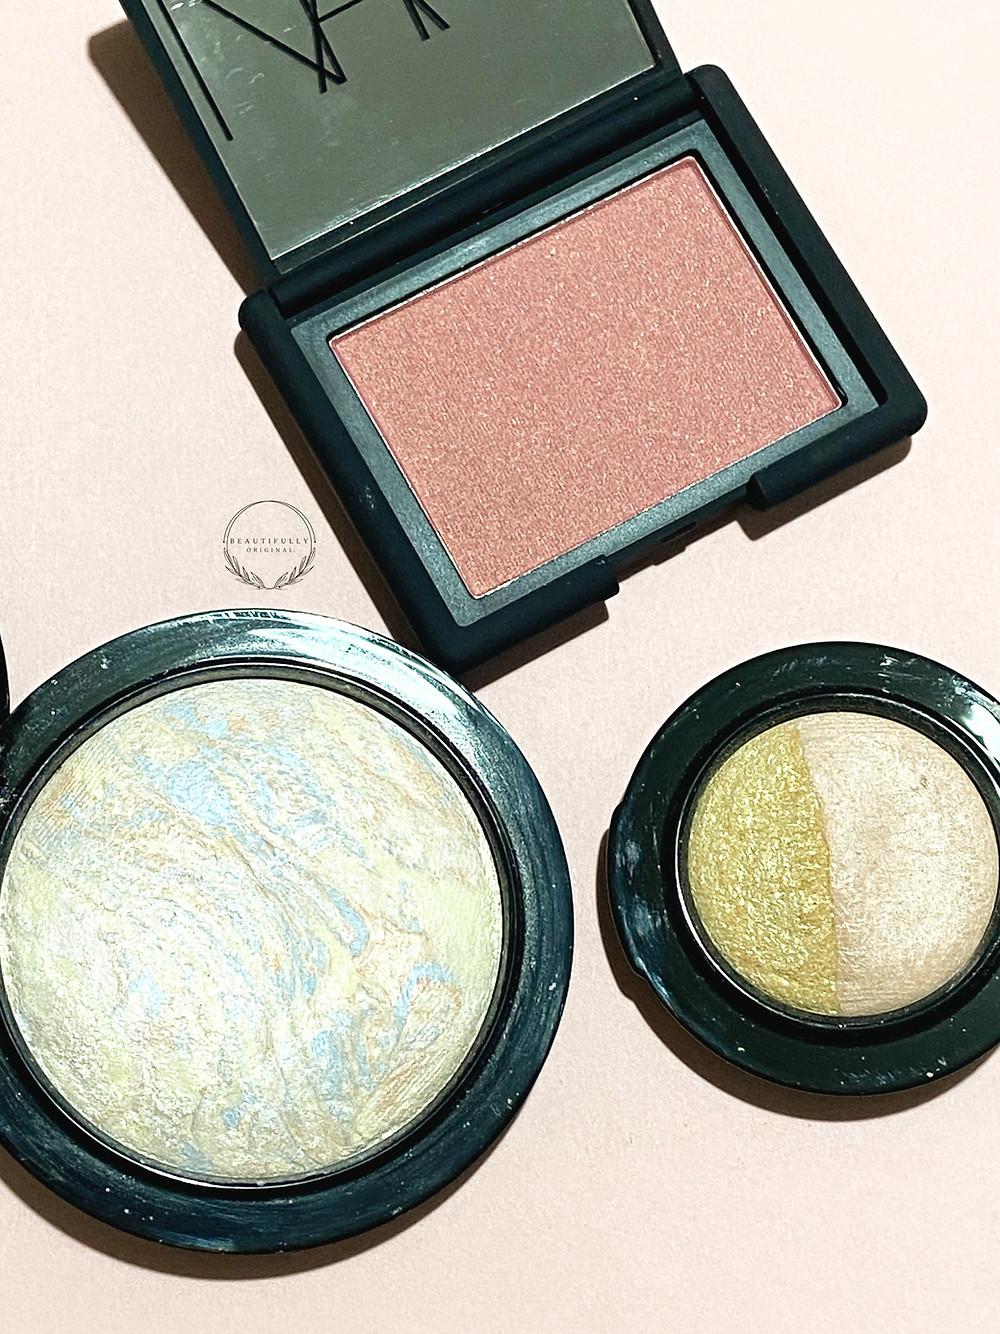 NARS Blush, MAC's lightscapade skin finish and eyeshadow on a pink background - beautifullyoriginal.com